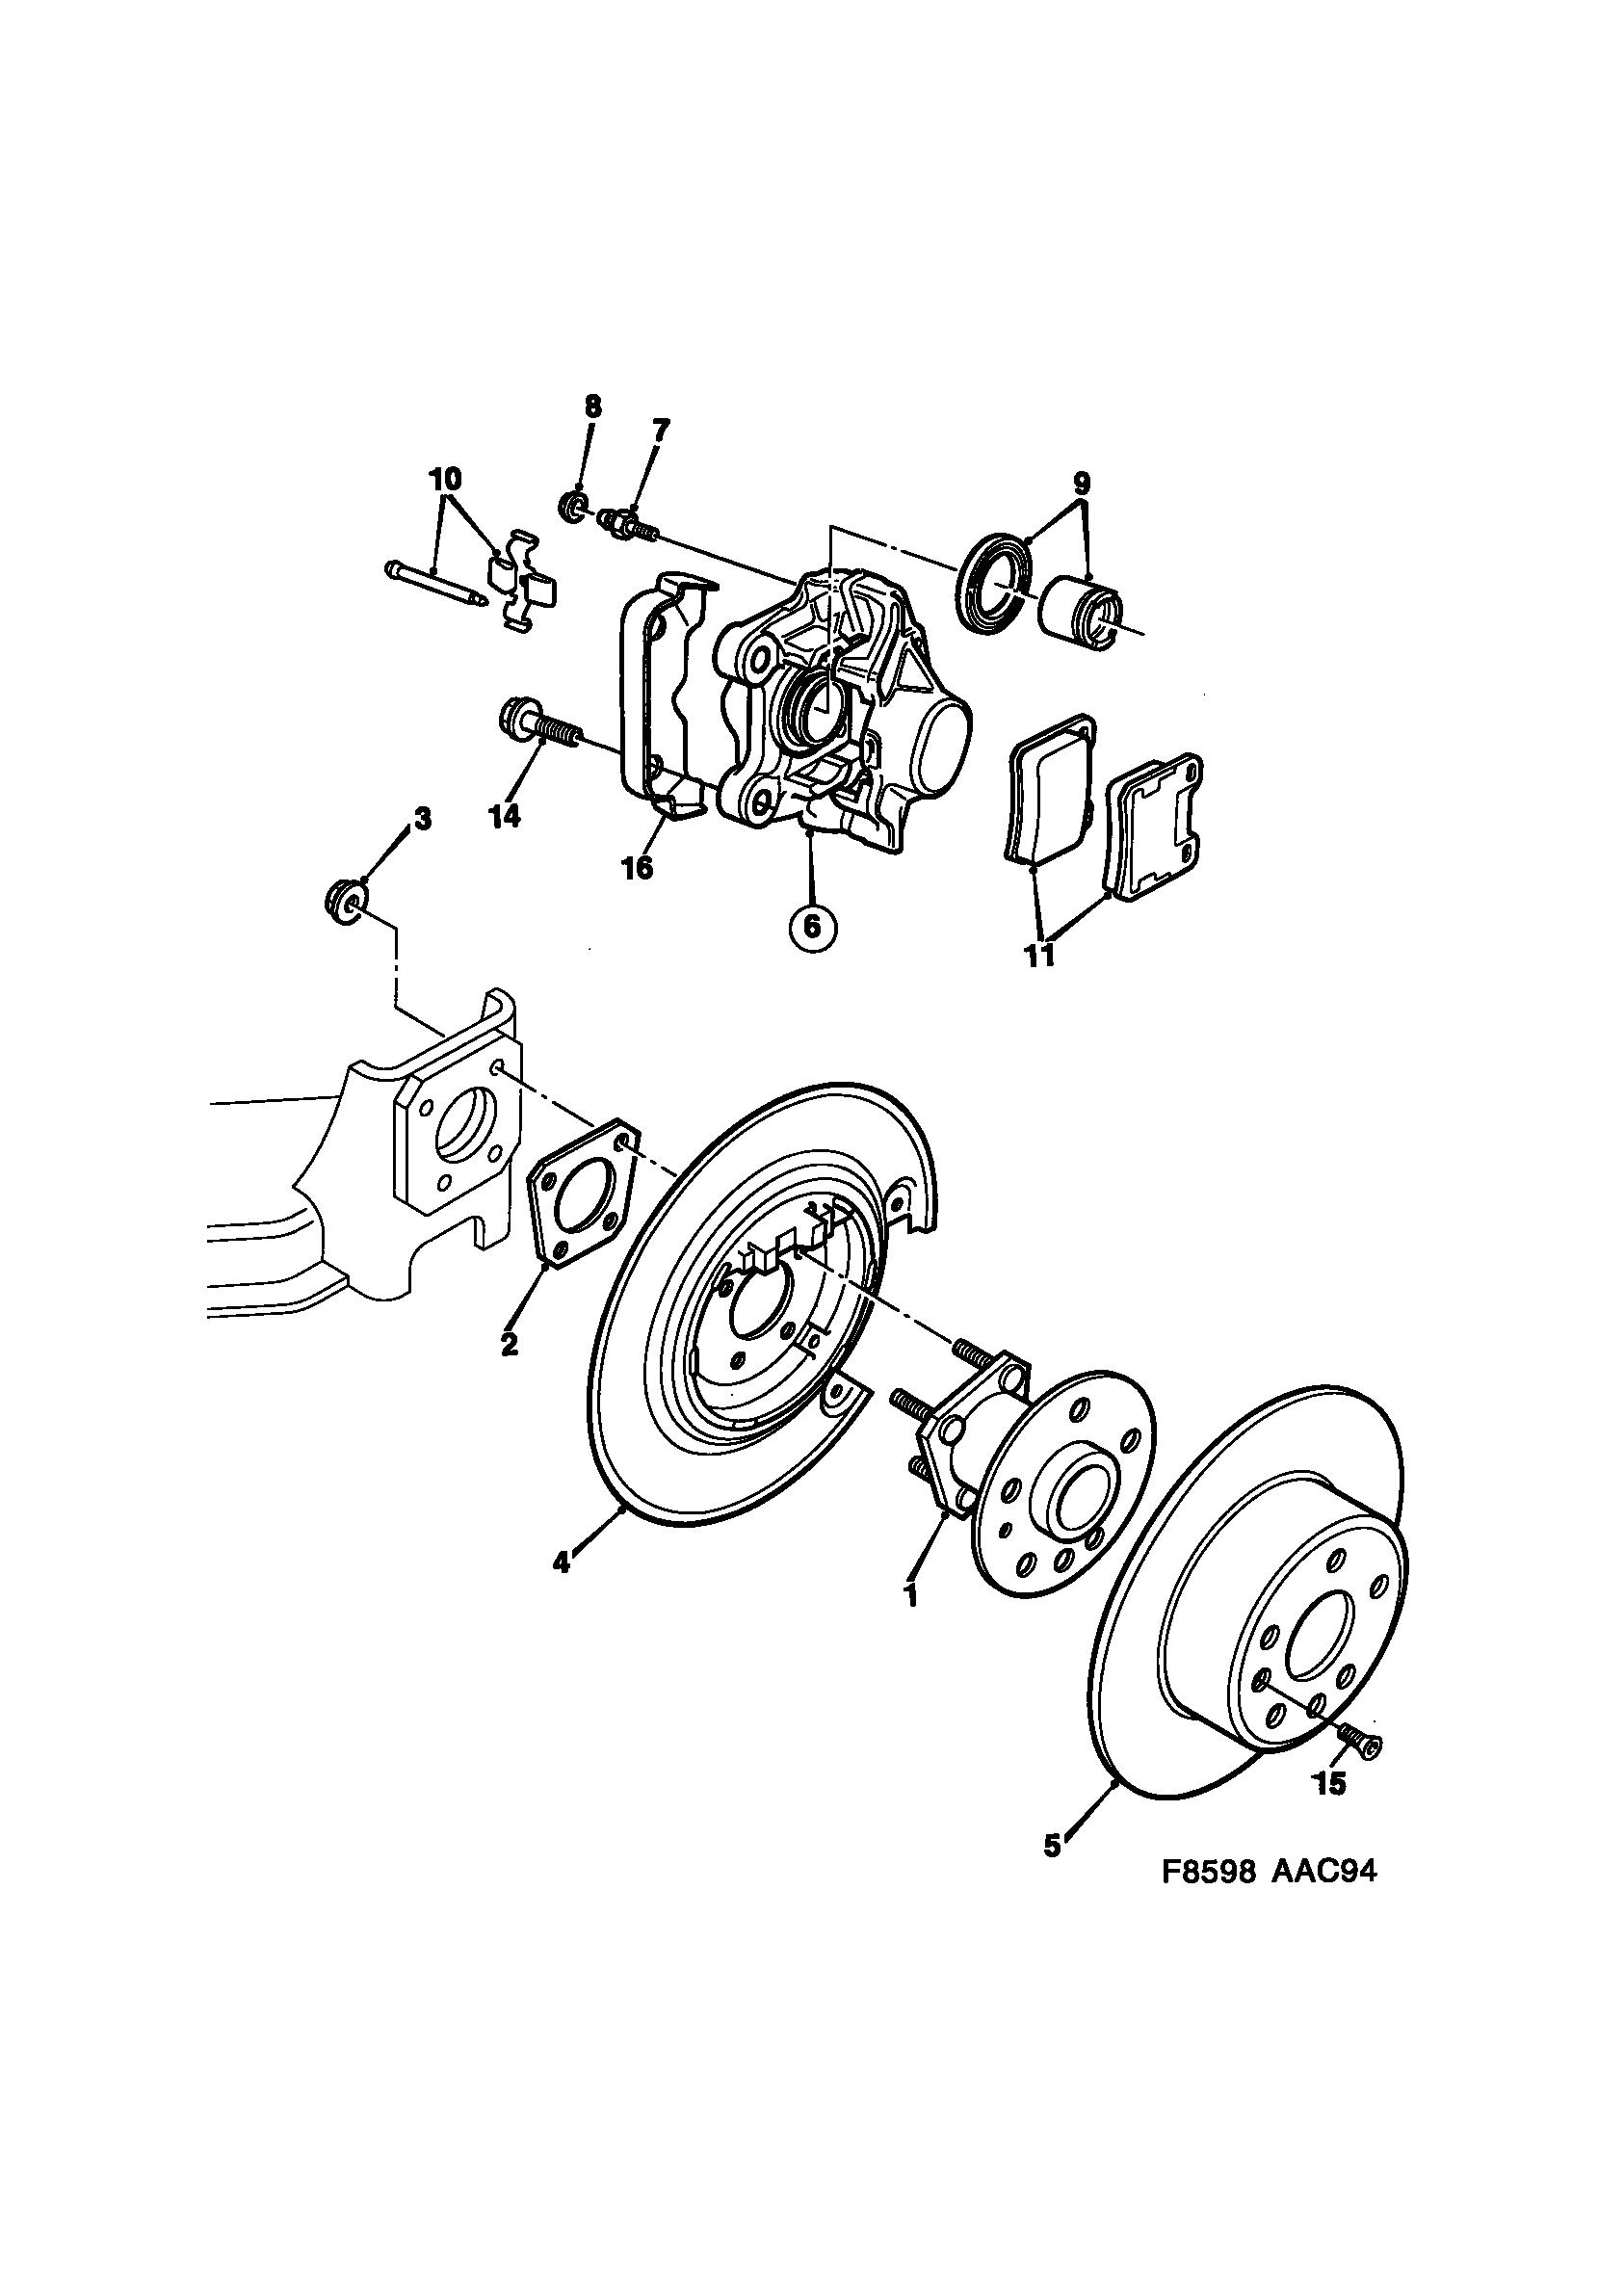 Saab 900 Brake Disc And Caliper 1994 1998 Epc Online Nemigacom Brakes Diagram Spare Parts Catalog